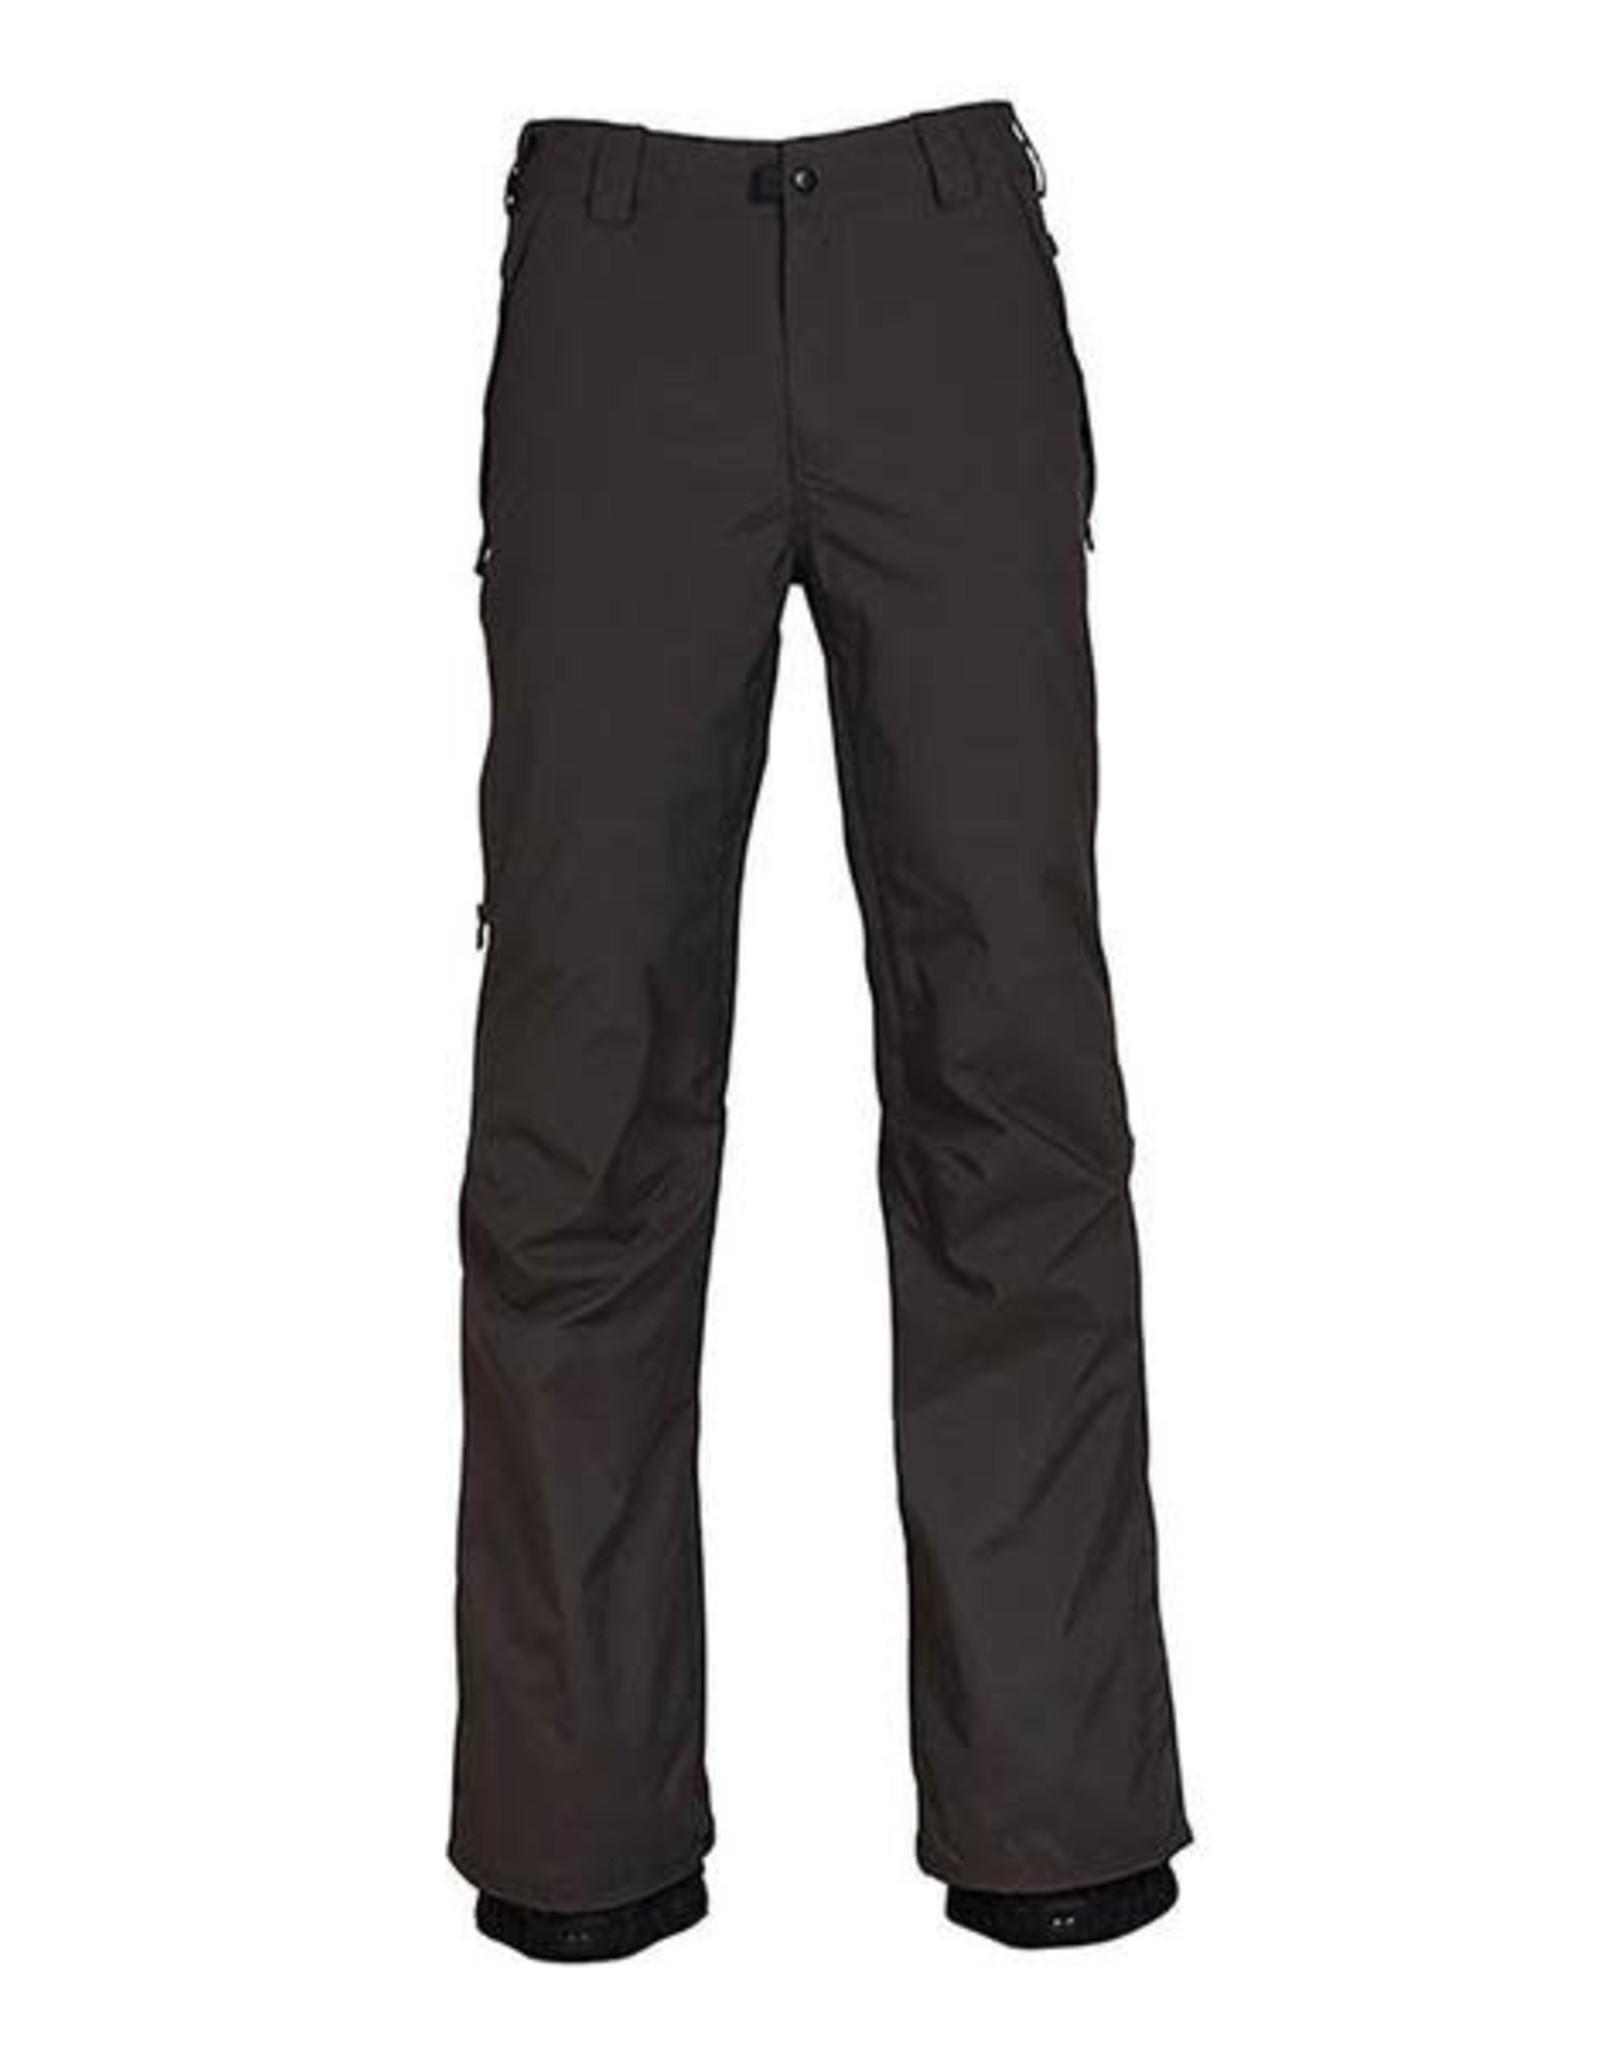 686 Standard Shell Pant